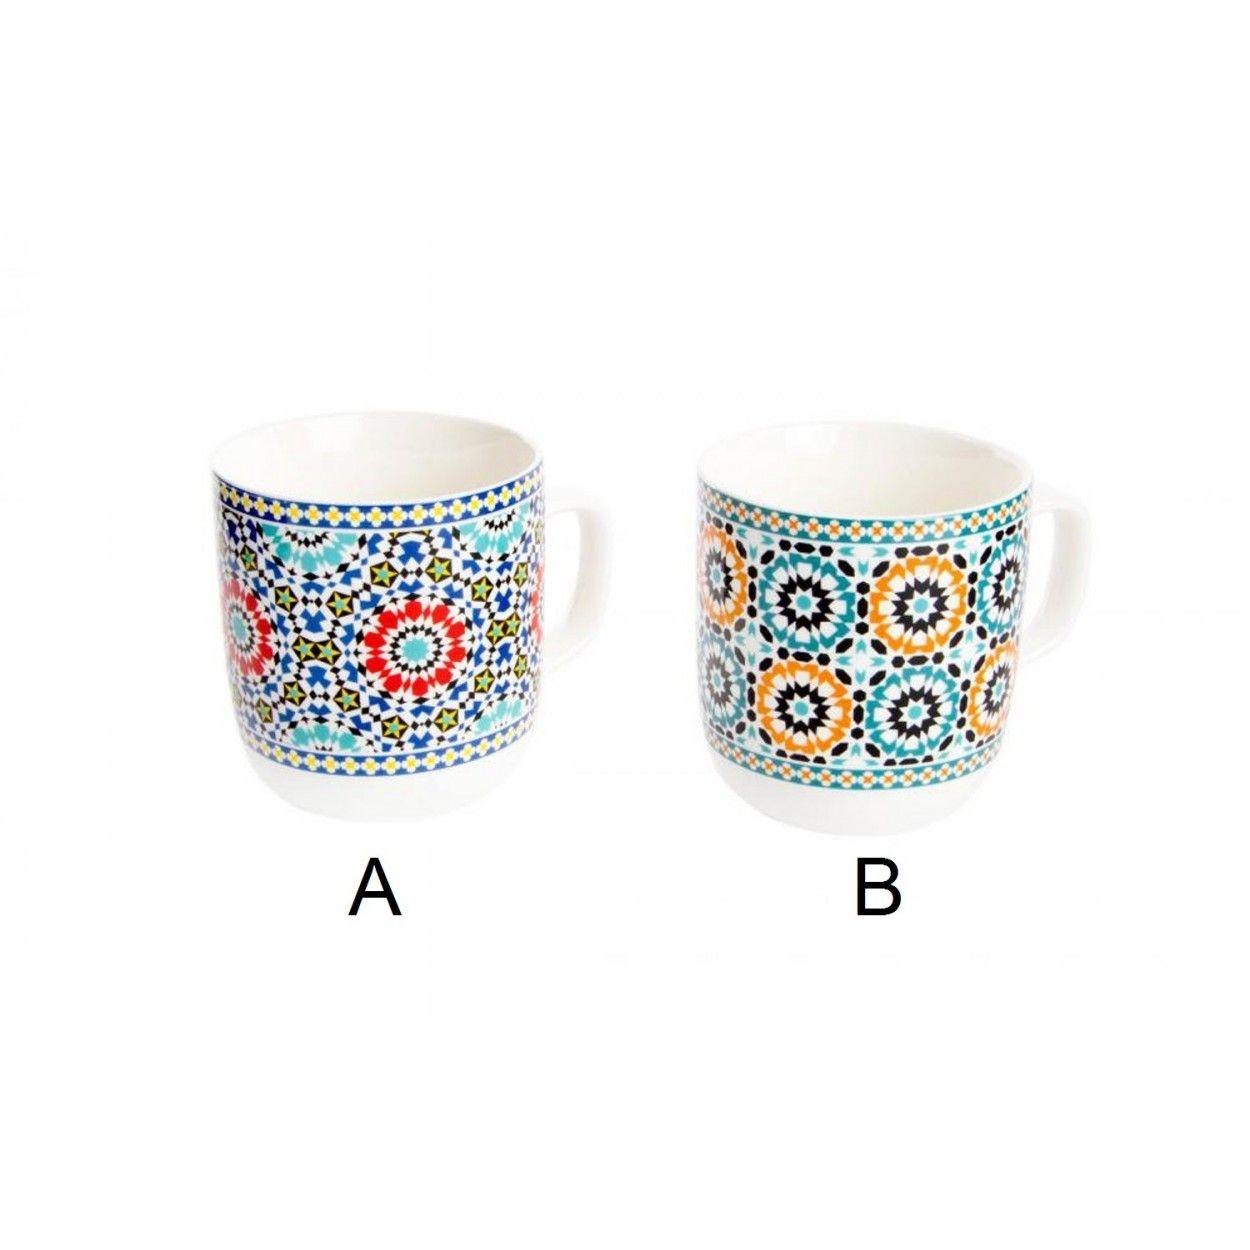 Taza De Porcelana Modelo Tnico Hogar Y M S